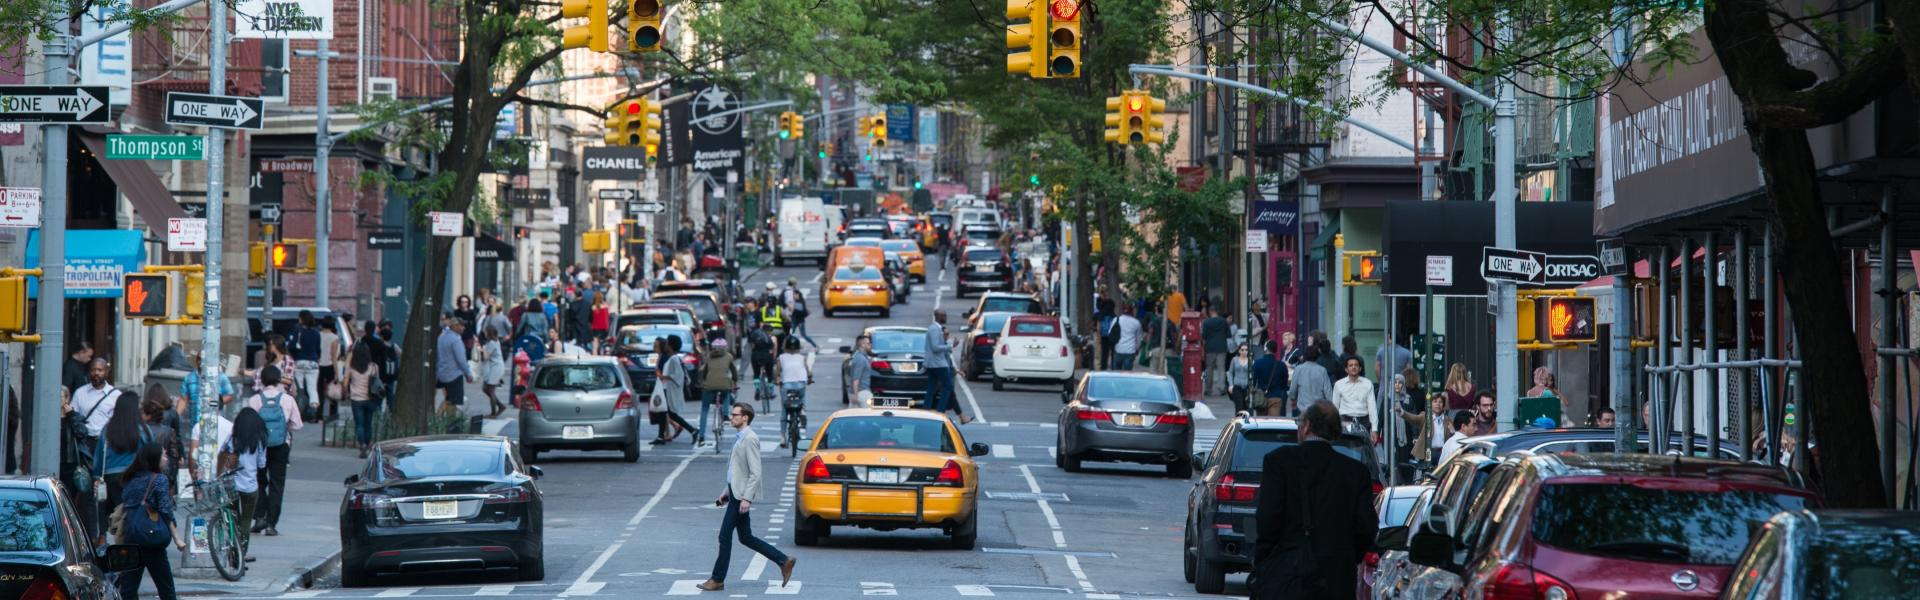 Crop-SoHo-Streets-Manhattan-NYC-Julienne-Schaer-009 copy